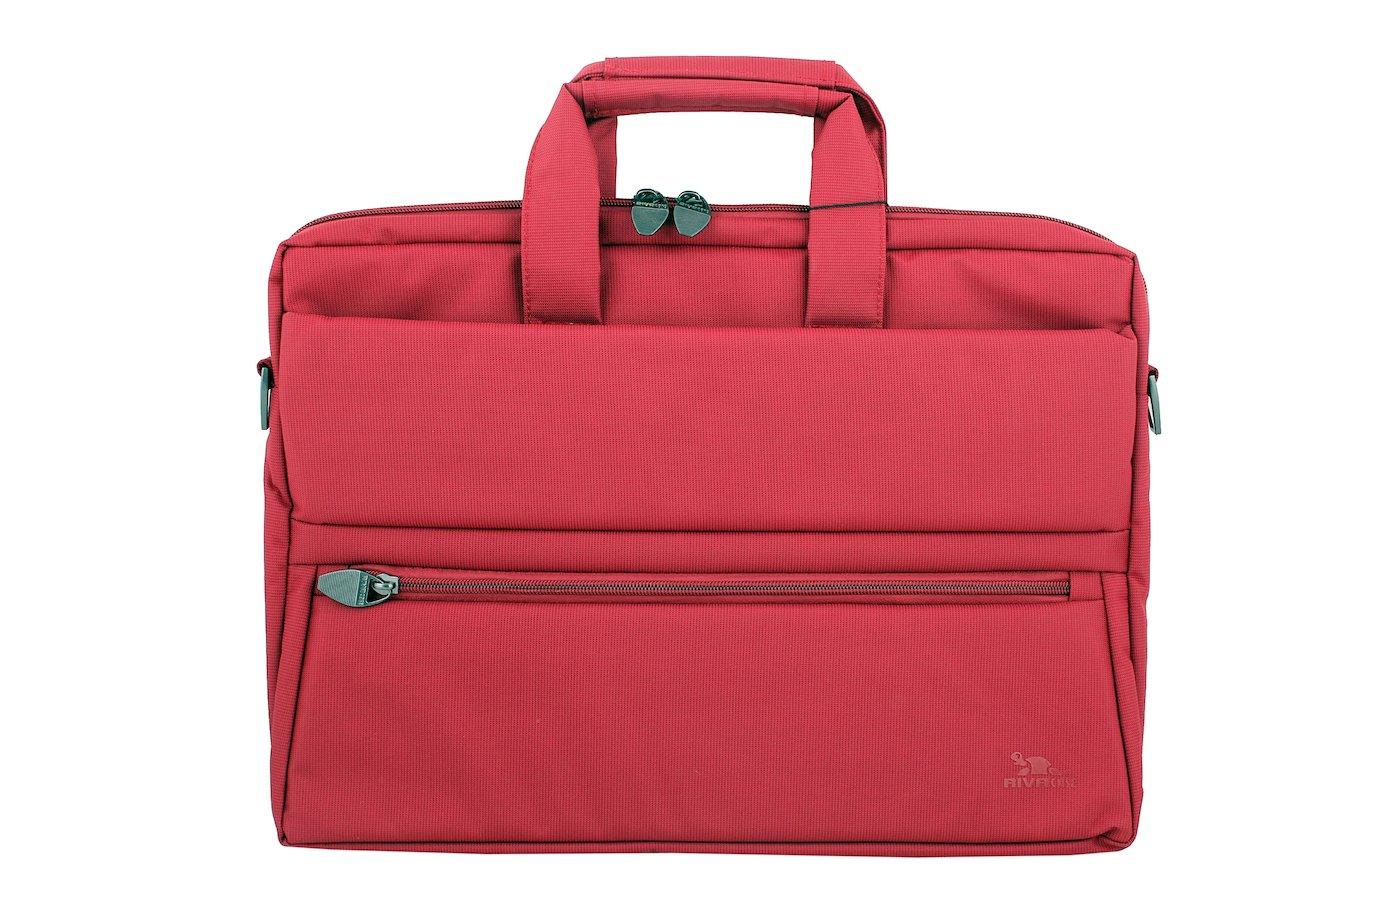 Кейс для ноутбука Riva Case 8630 red 15.6